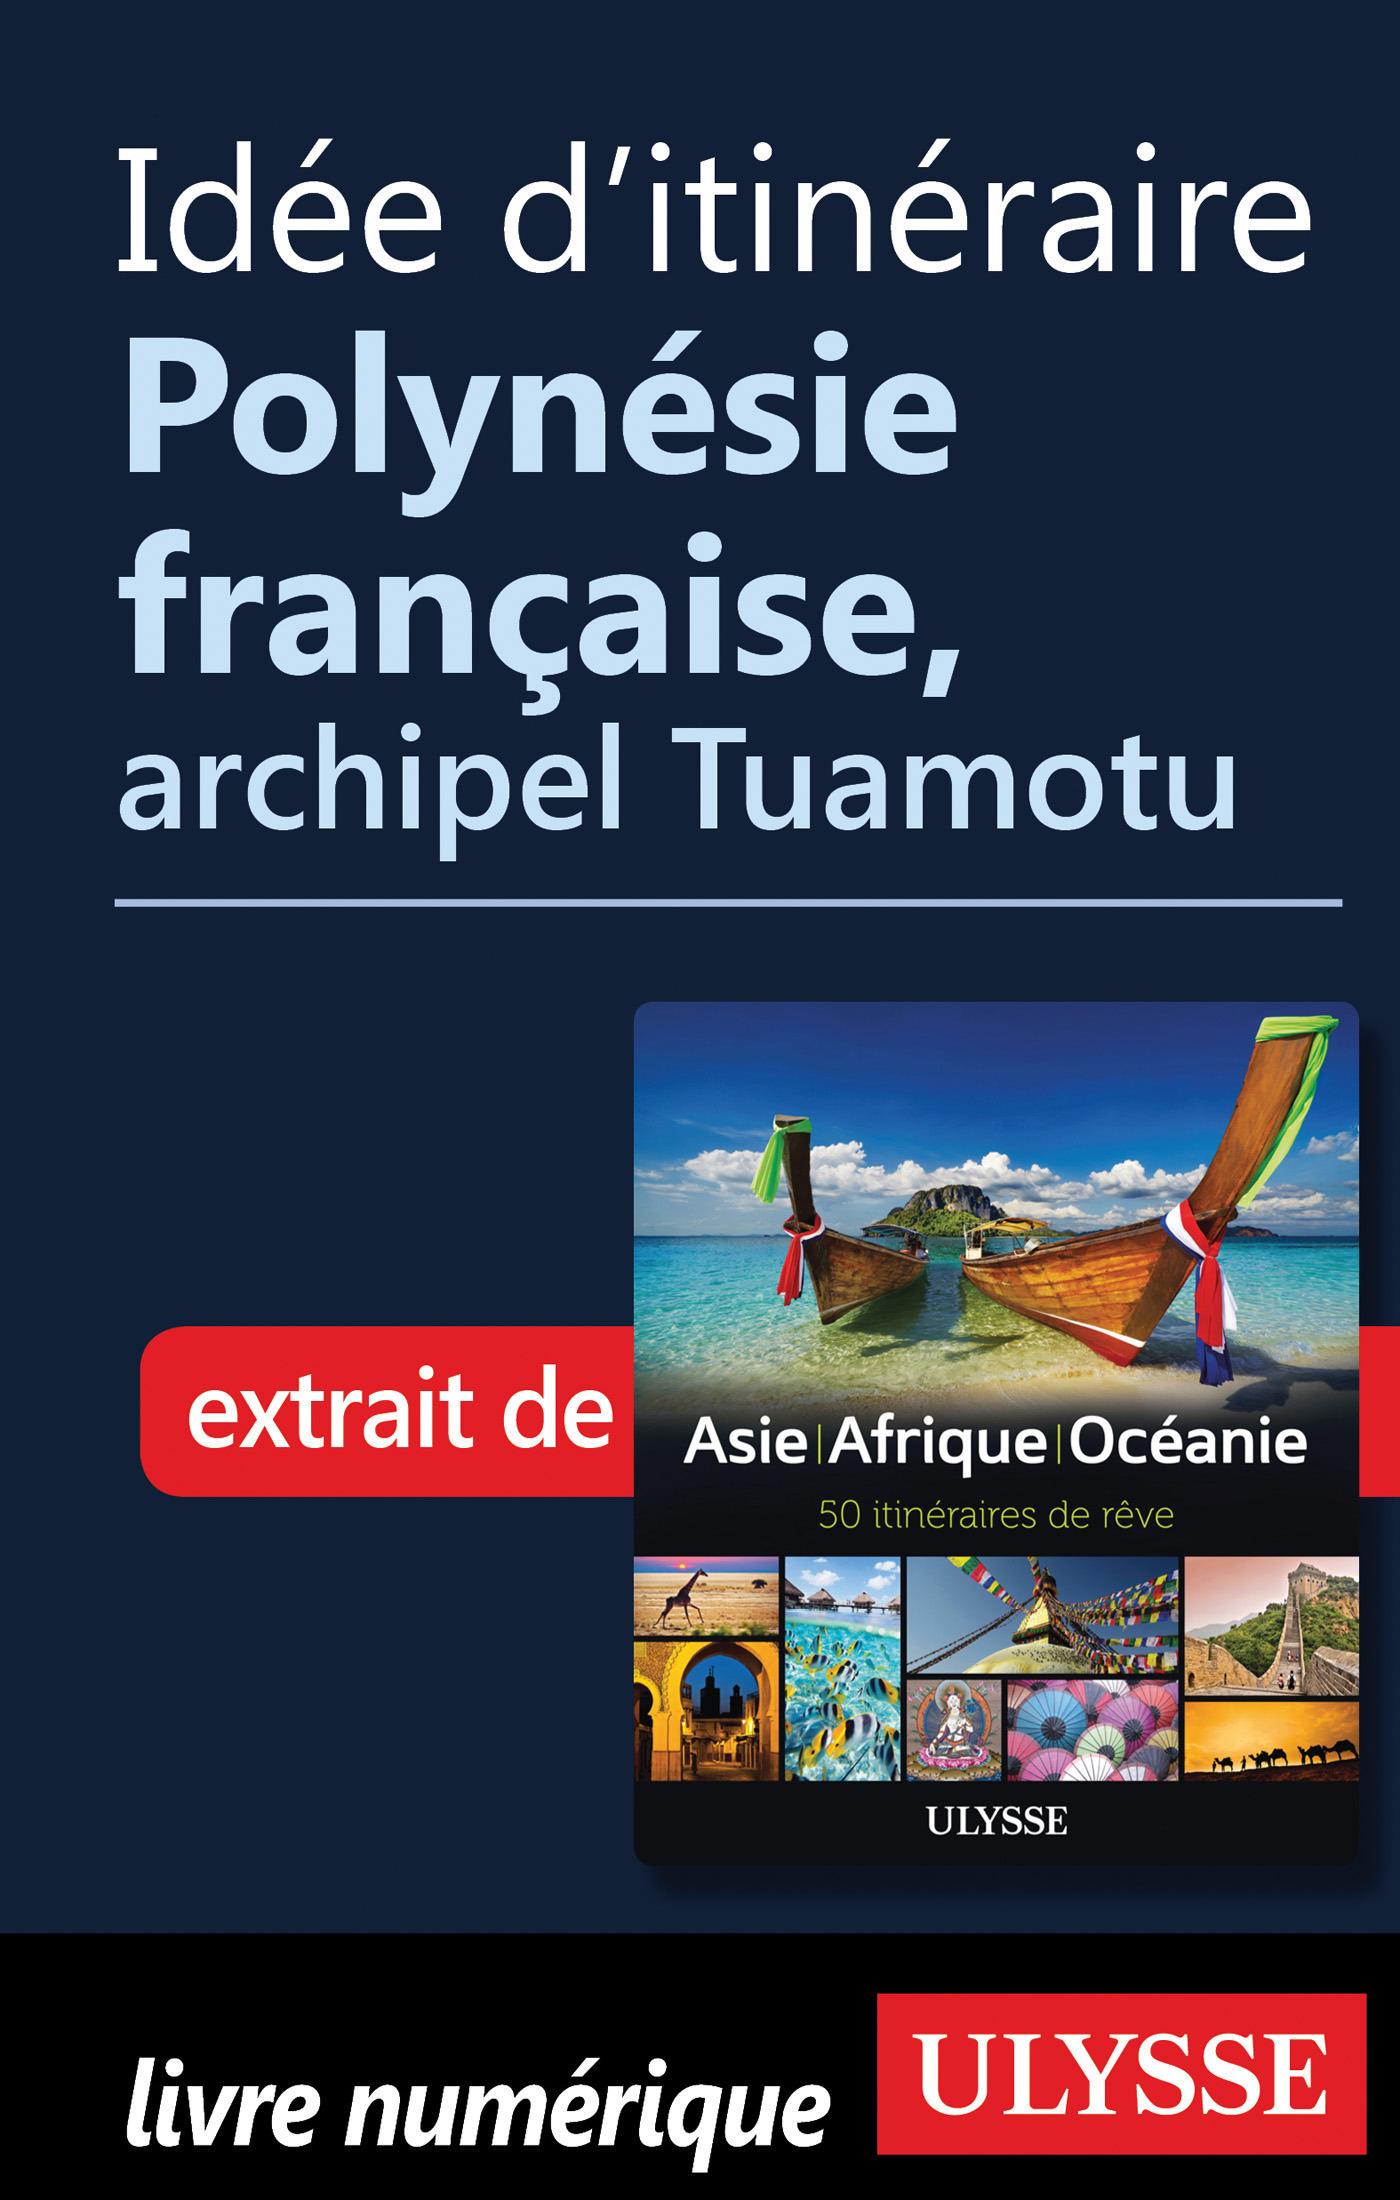 Idée d'itinéraire - Polynésie française, archipel Tuamotu